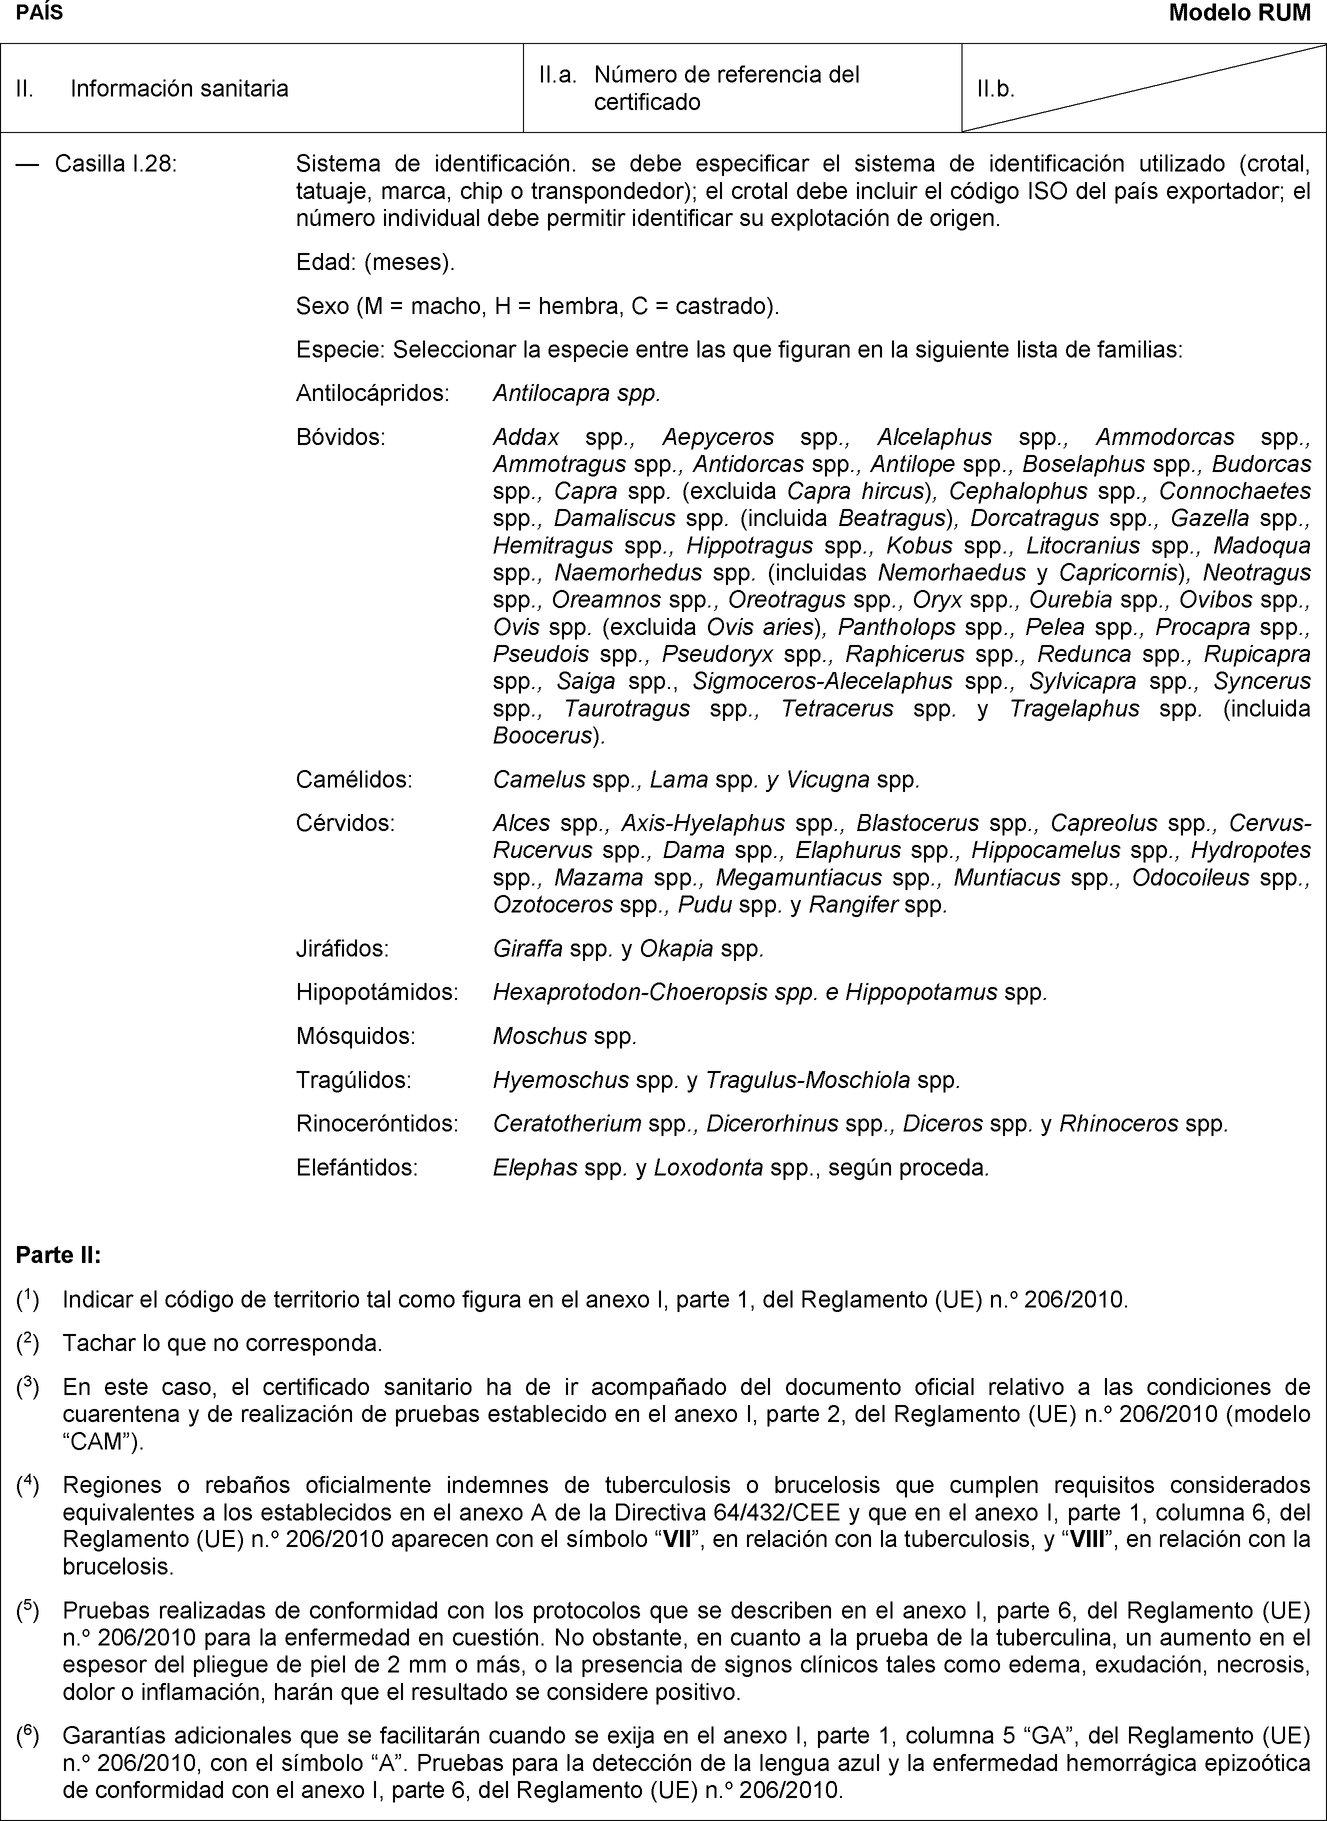 EUR-Lex - 32017R0384 - EN - EUR-Lex